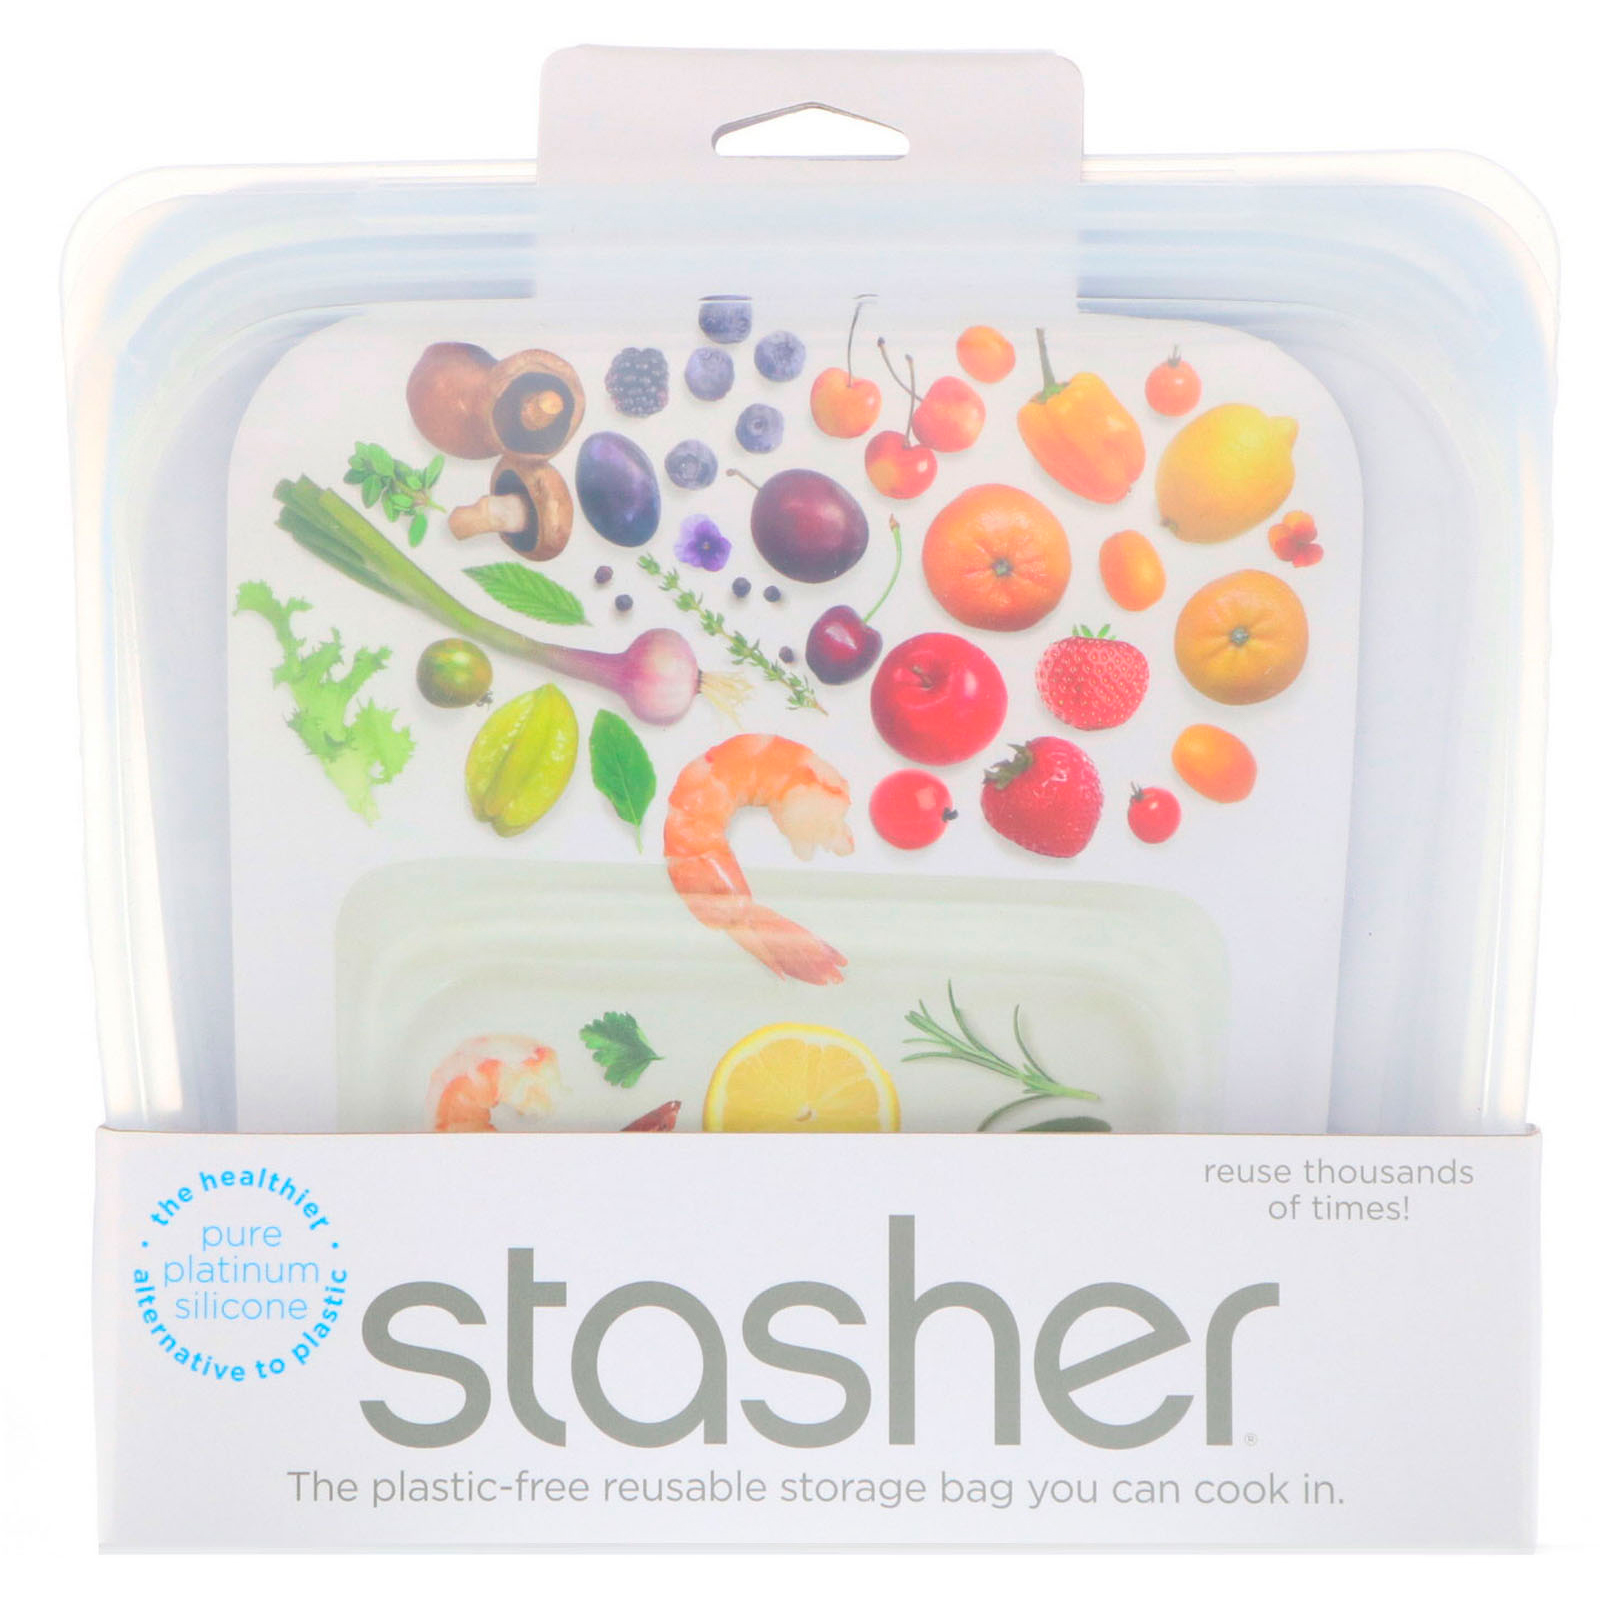 Stasher Reusable Silicone Food Bag Sandwich Size Medium